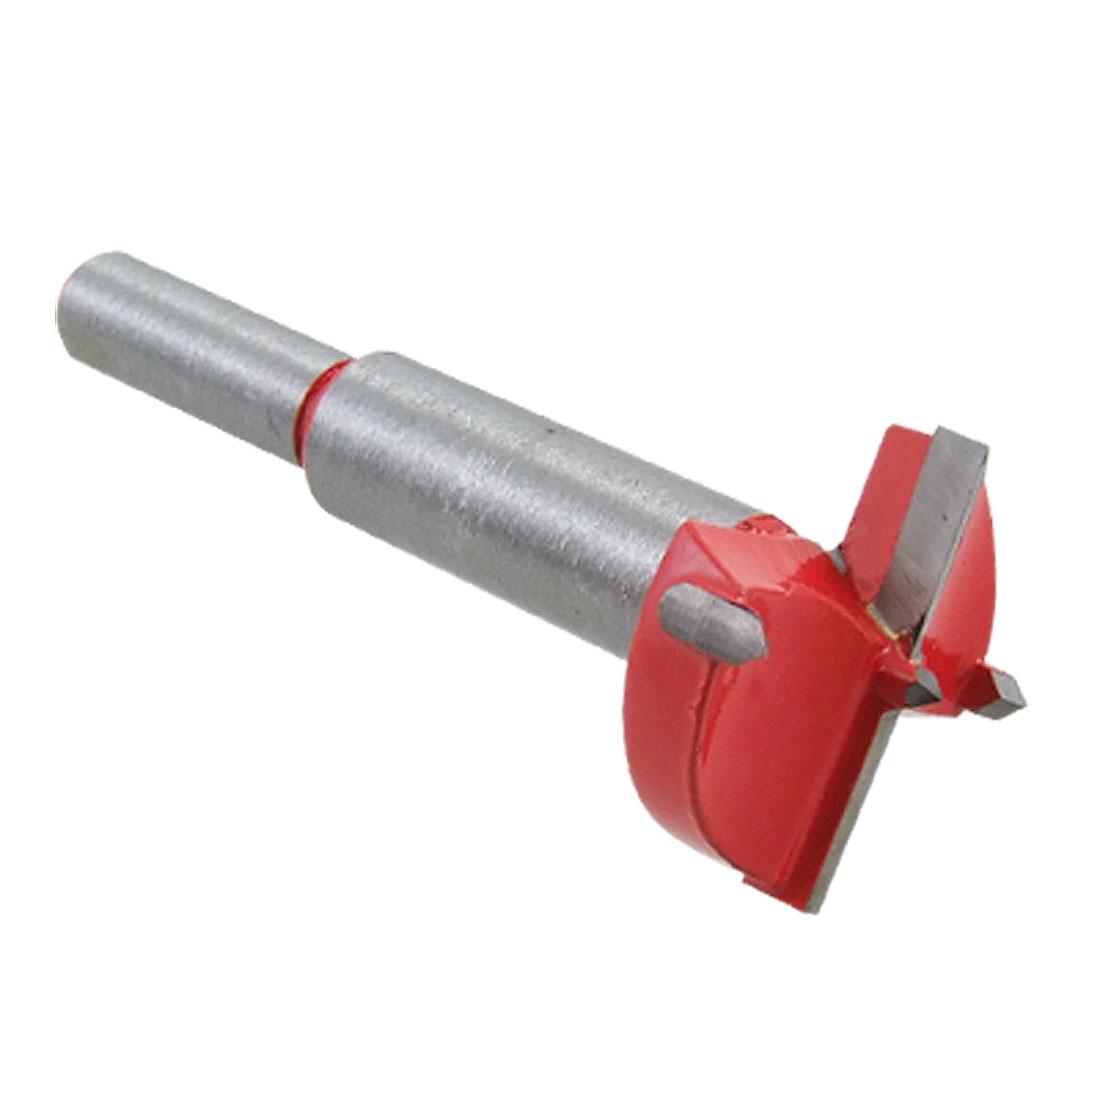 Woodworking 9mm Shank 30mm Dia Hinge Boring Bit Drill Tool